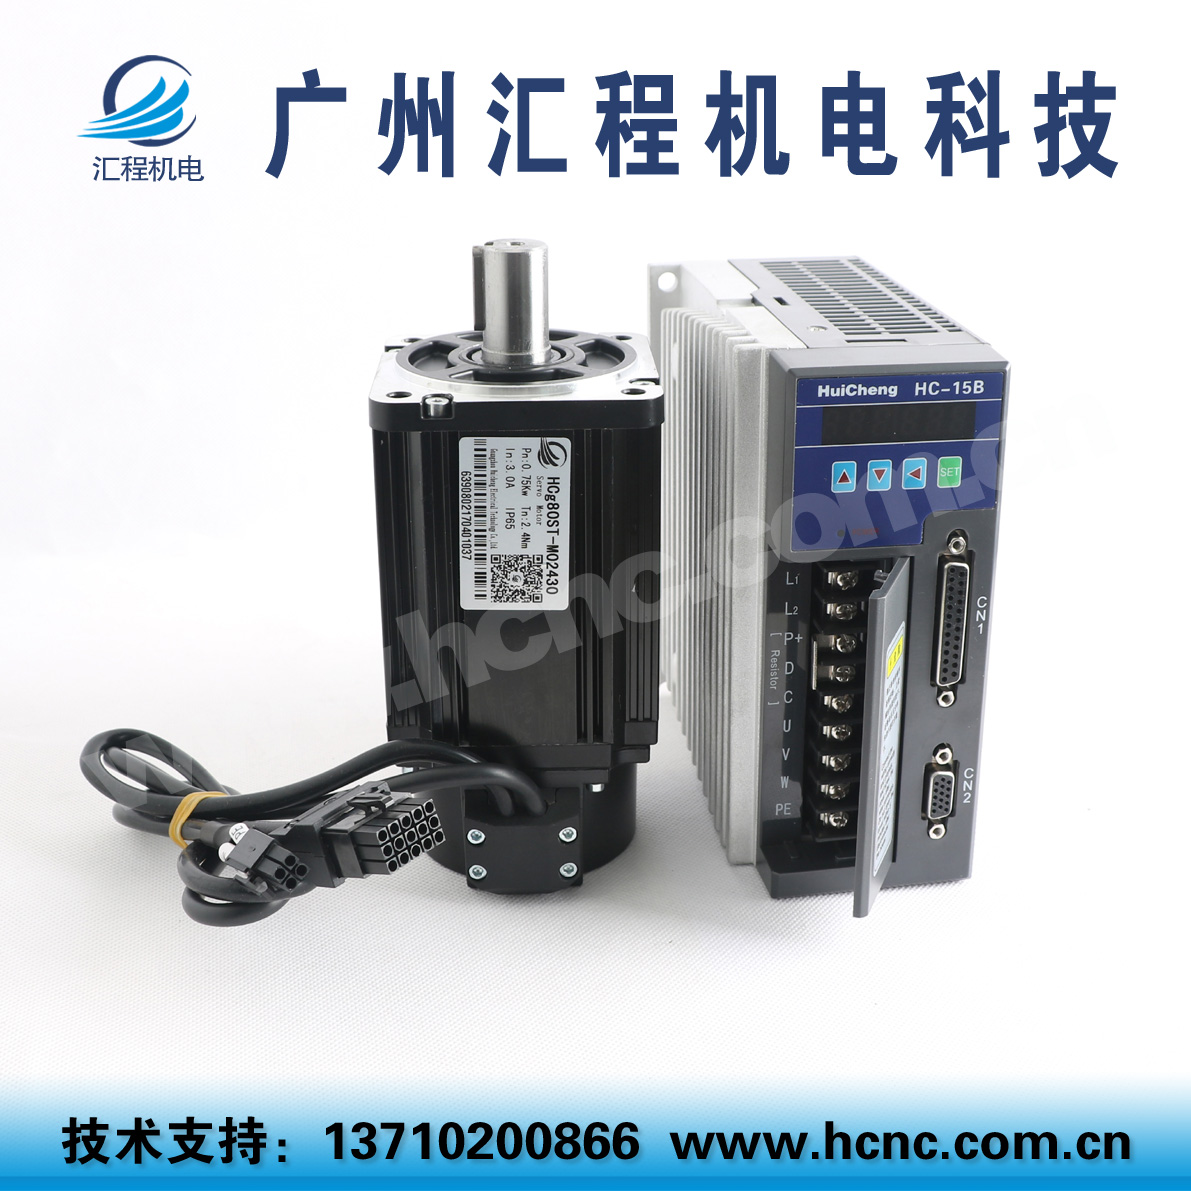 HCg80ST-M02430交流伺服电机0.75Kw,4Nm,轴径19mm和HC-15B驱动器